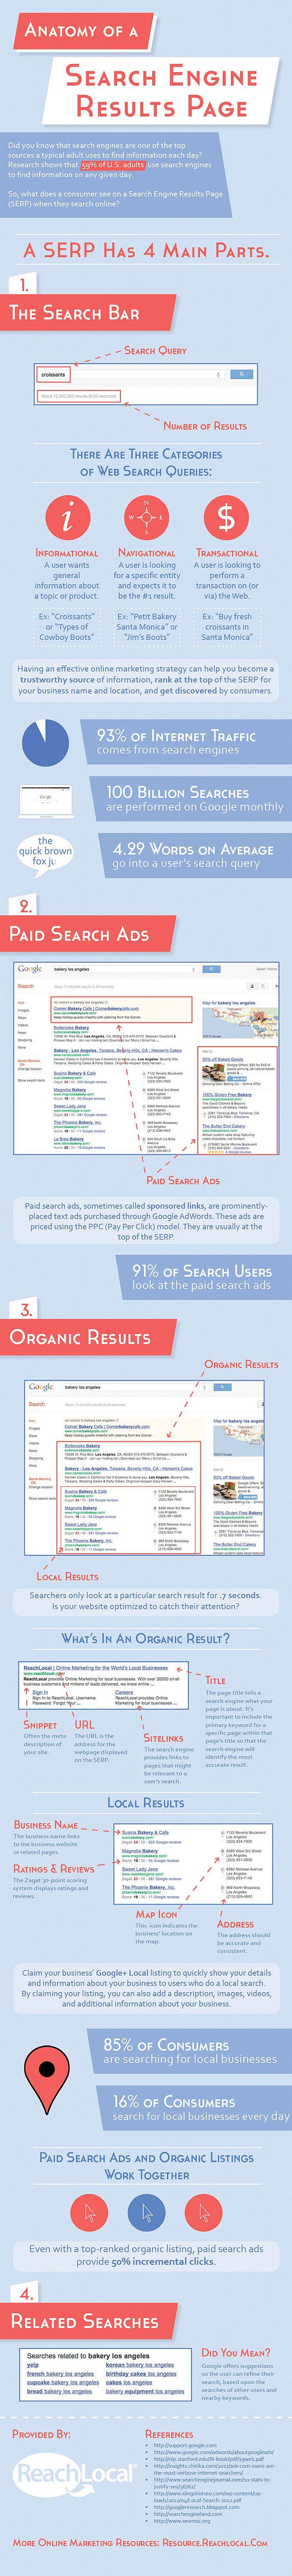 Advertising-Infographics-Infographie-anatomie-dune-SERP-Actualites Advertising Infographics : Infographie : anatomie d'une SERP - Actualités SEO et moteurs - Abondance